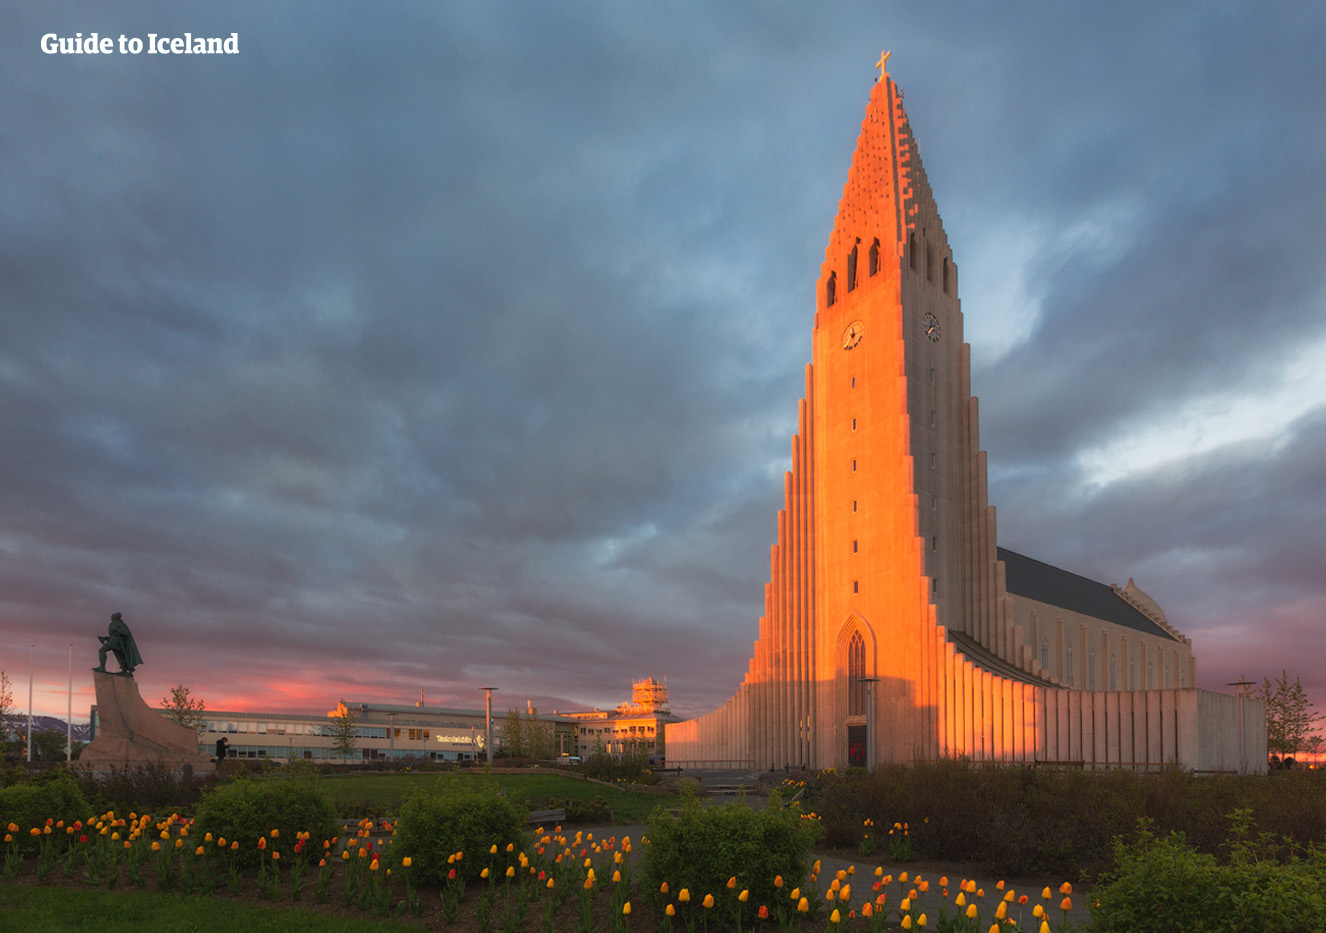 Hallgrímskirkja is the iconic church of Iceland's capital city, Reykjavík.